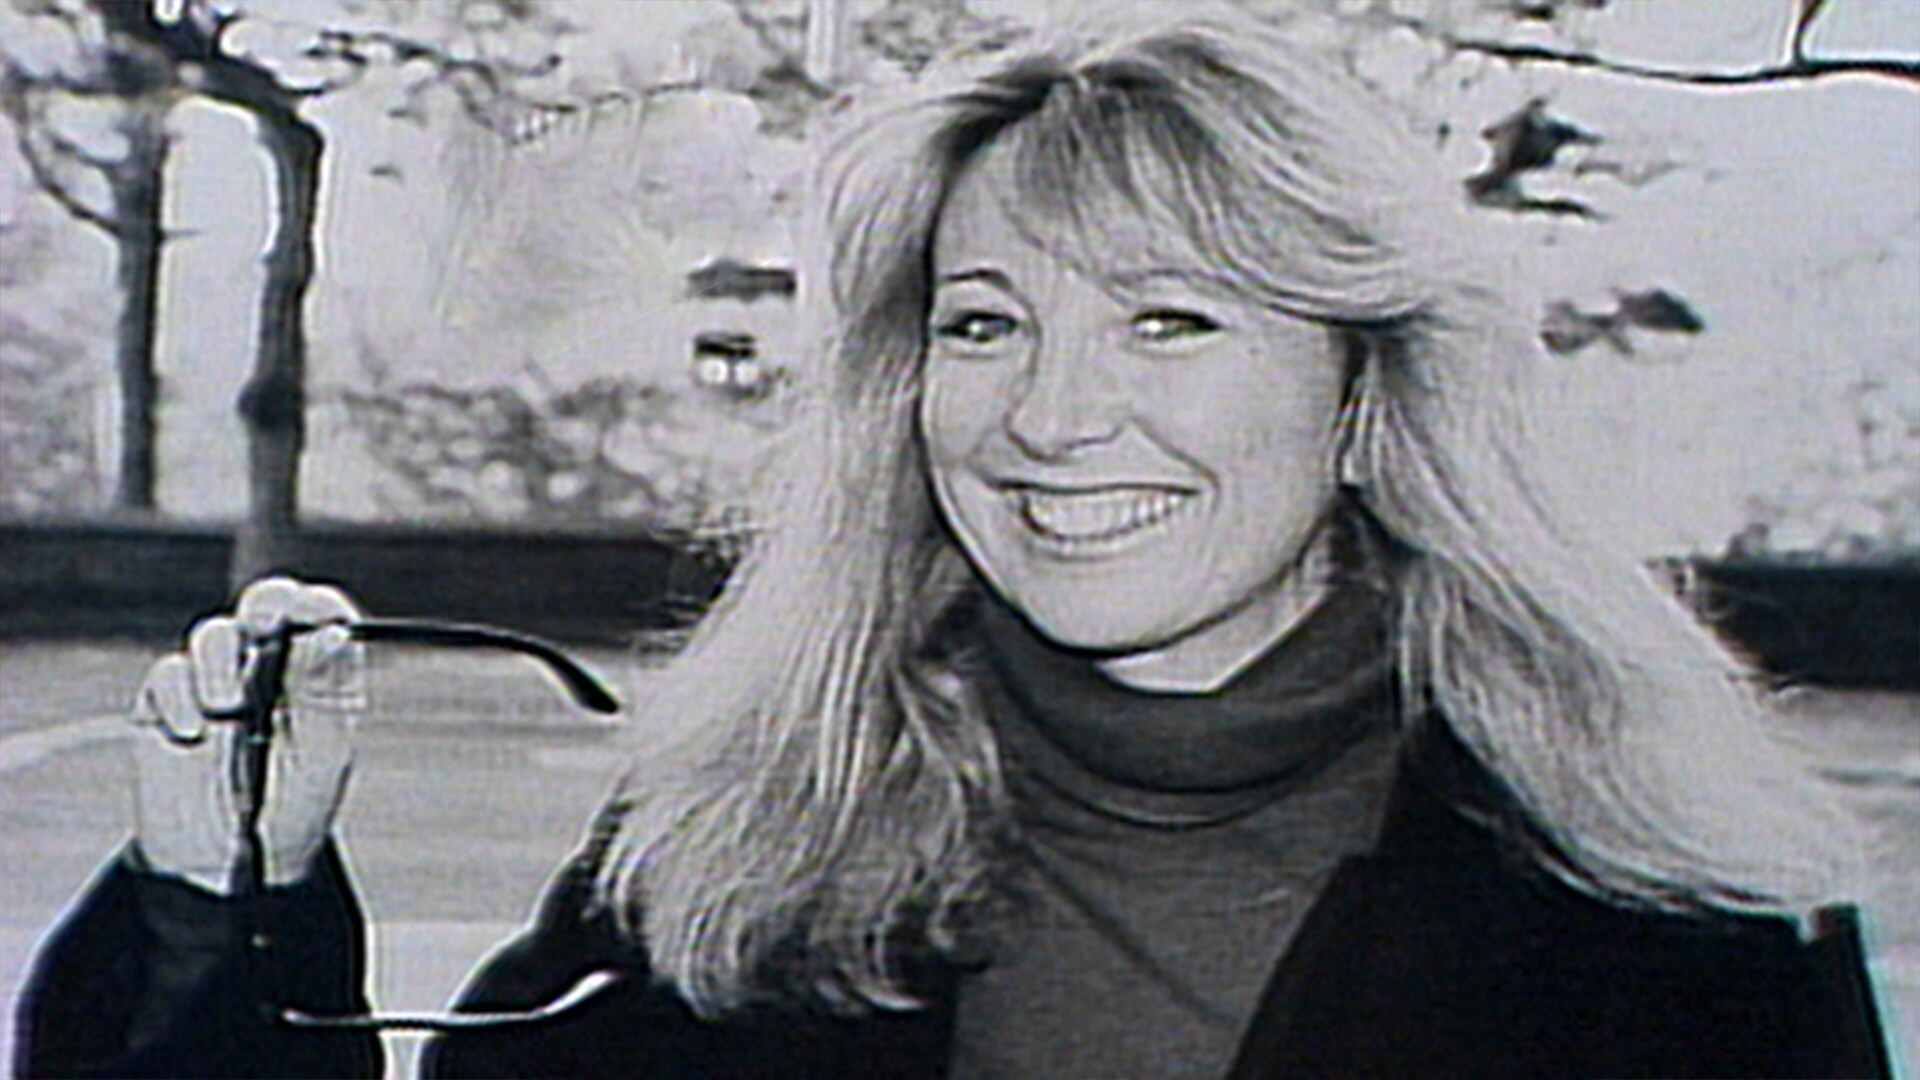 Teri Garr: November 12, 1983